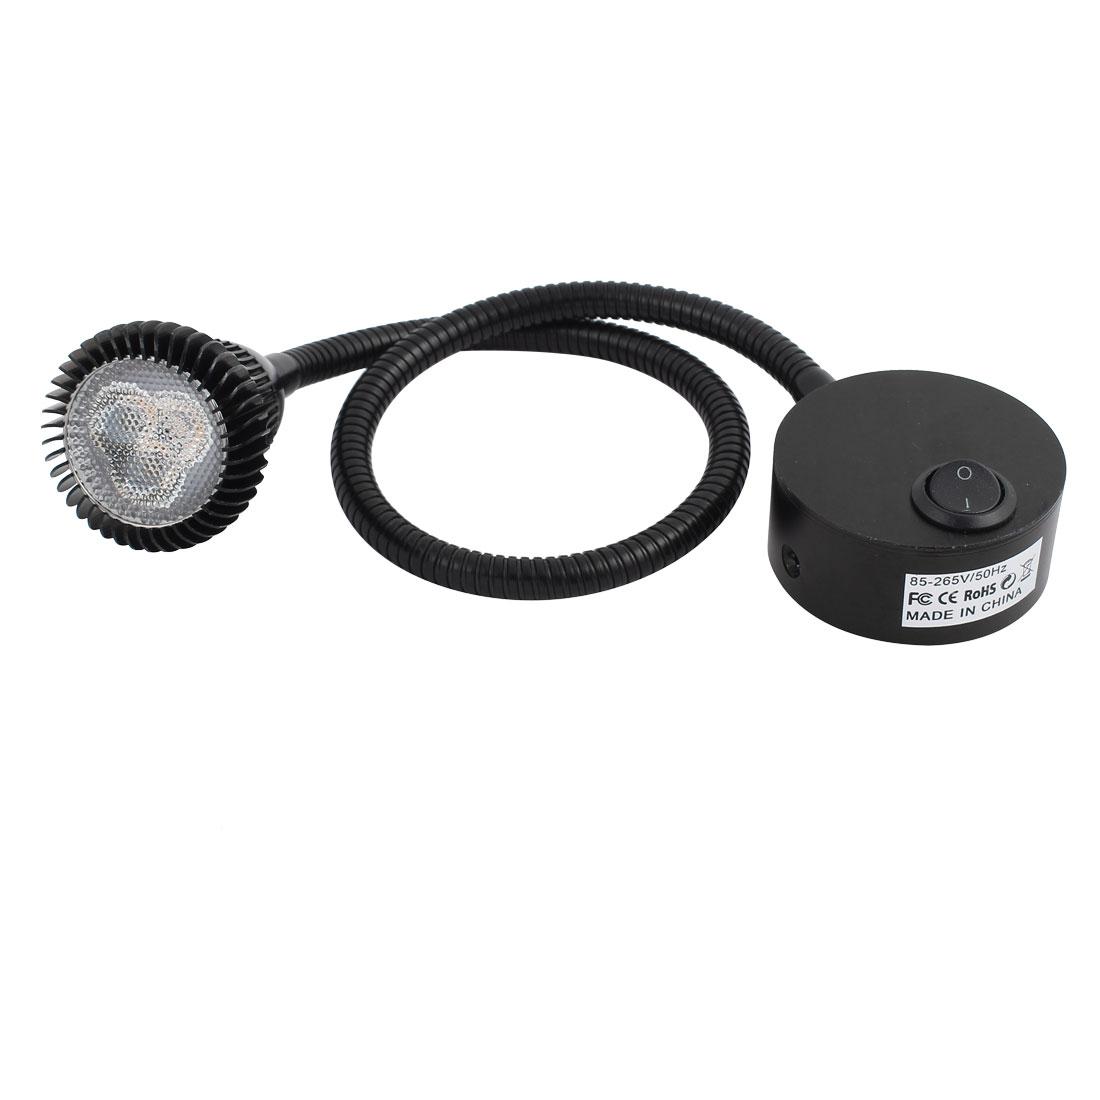 AC85-265V 3*1W 6000K 50CM Flexible Hose LED Spot Light Lamp w Switch Black